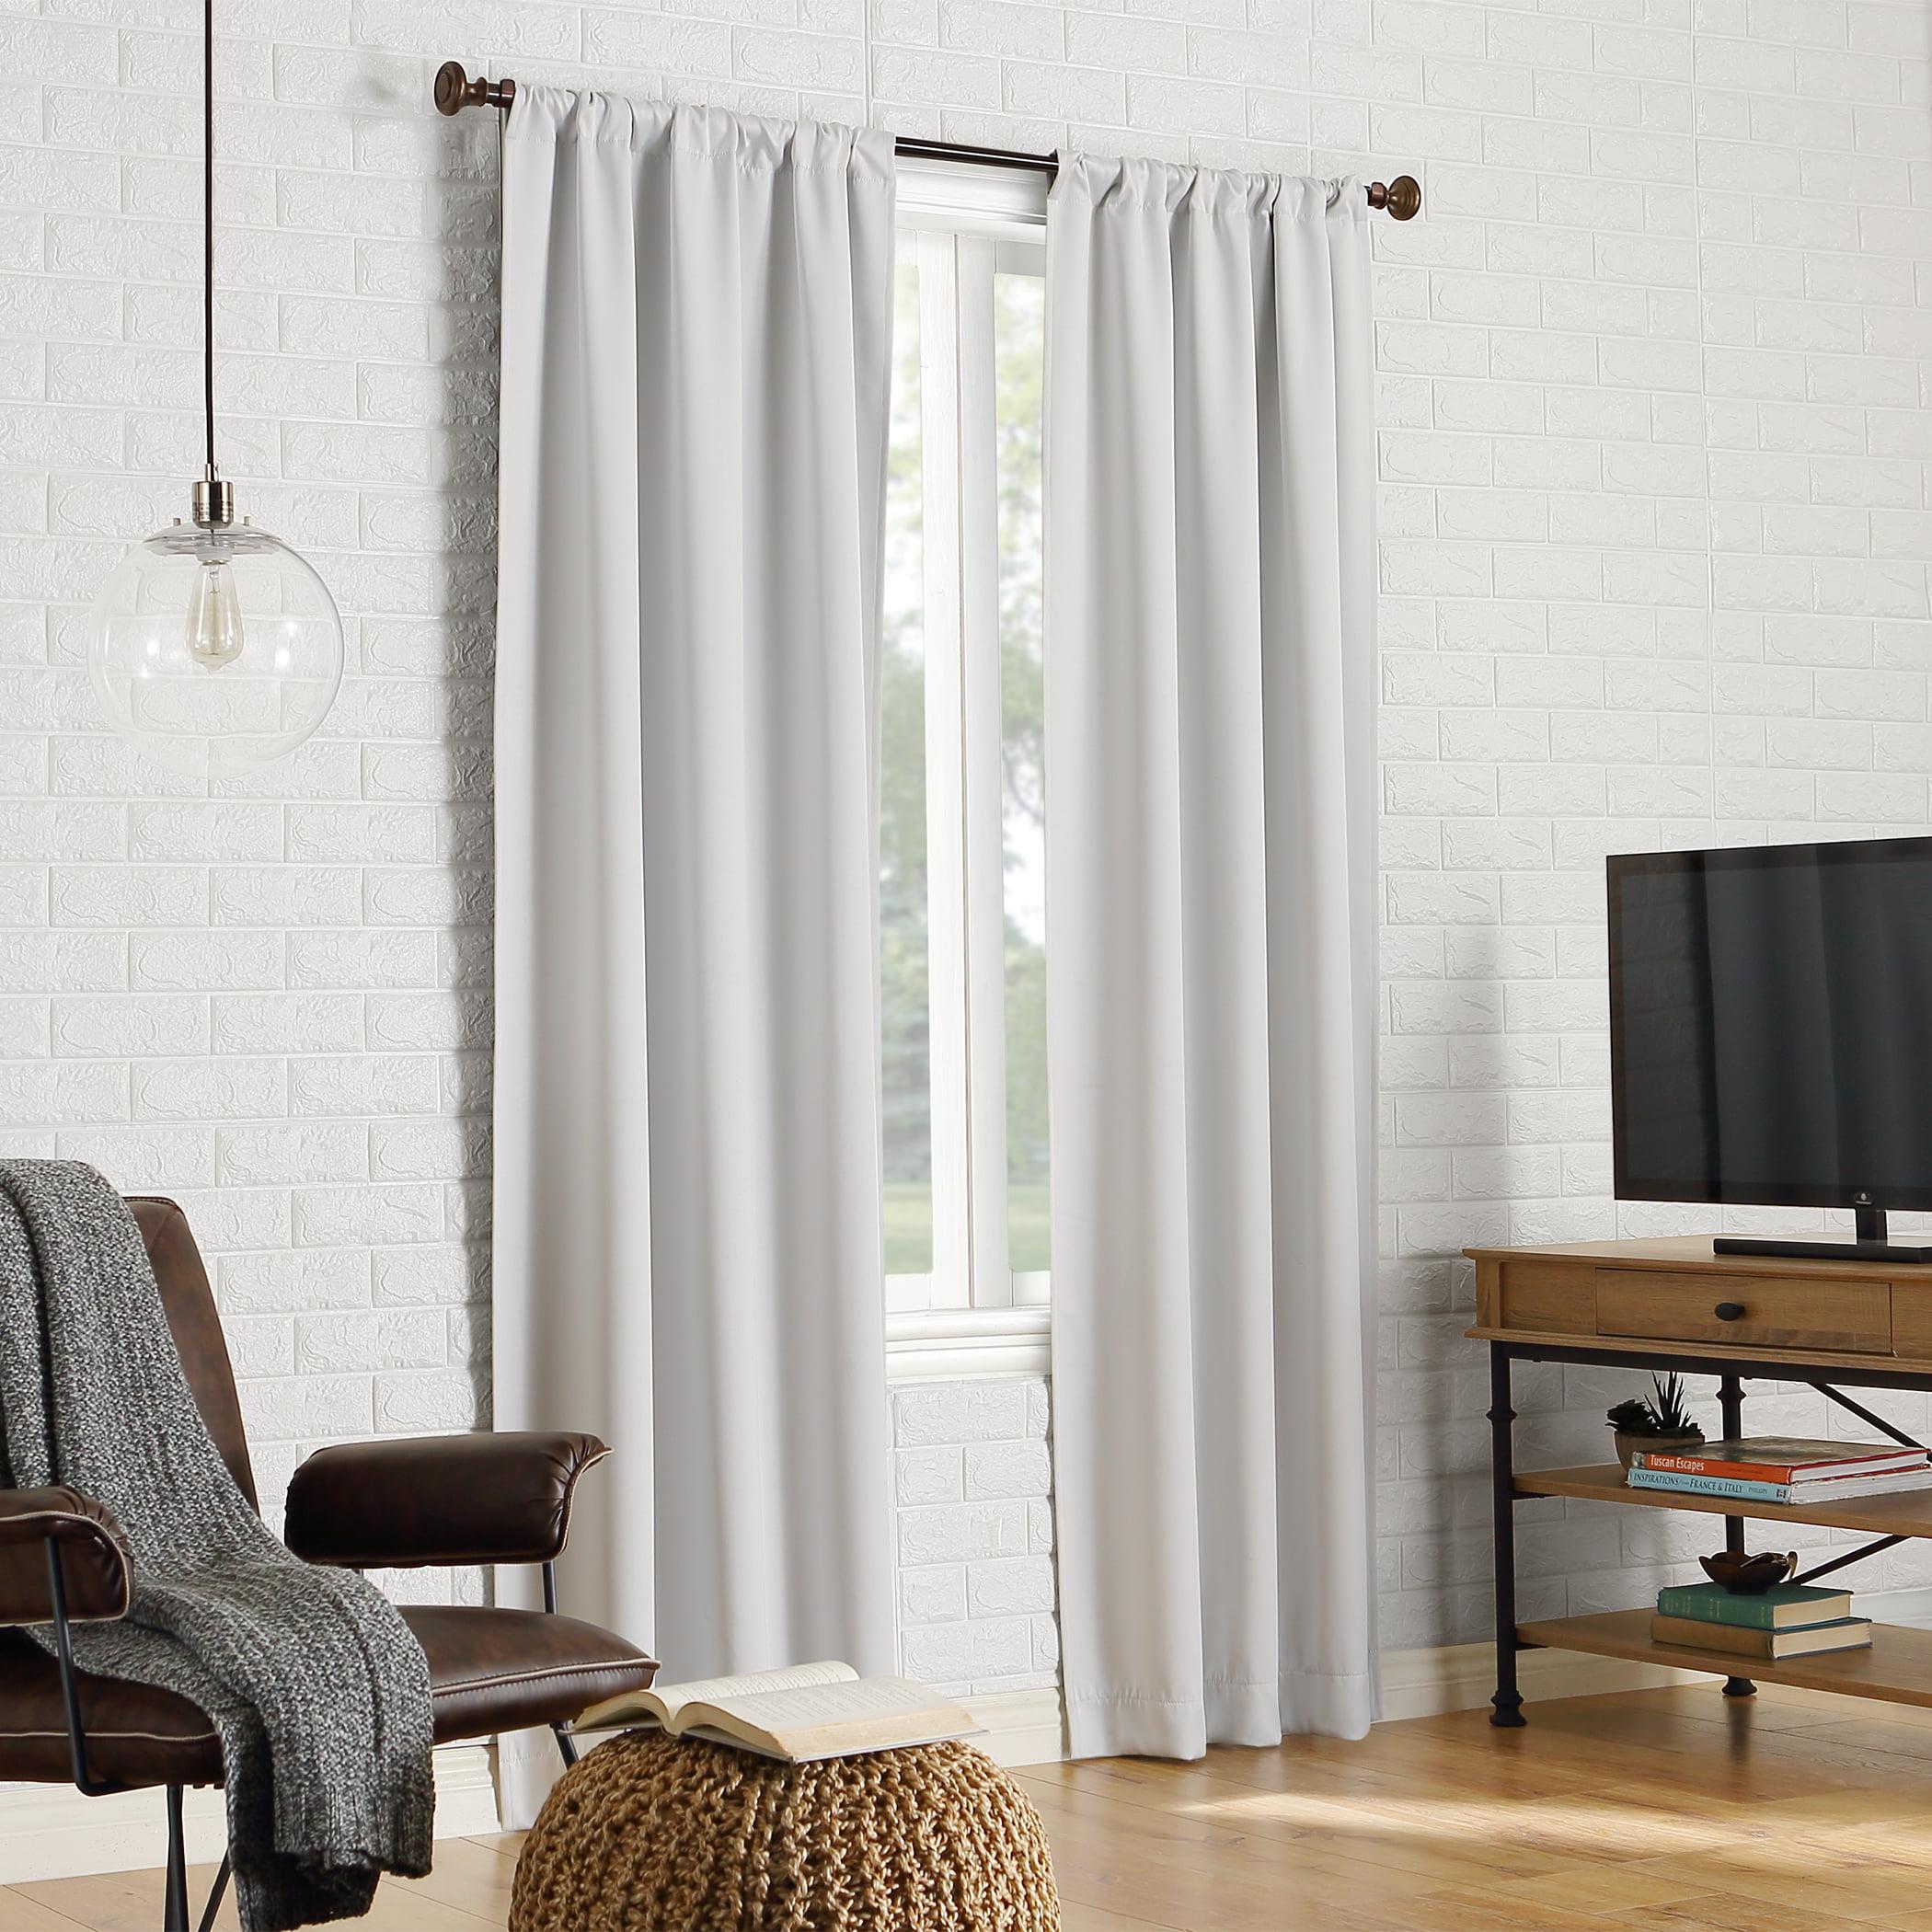 Sun Zero Avery 100% Blackout Rod Pocket Curtain Panel